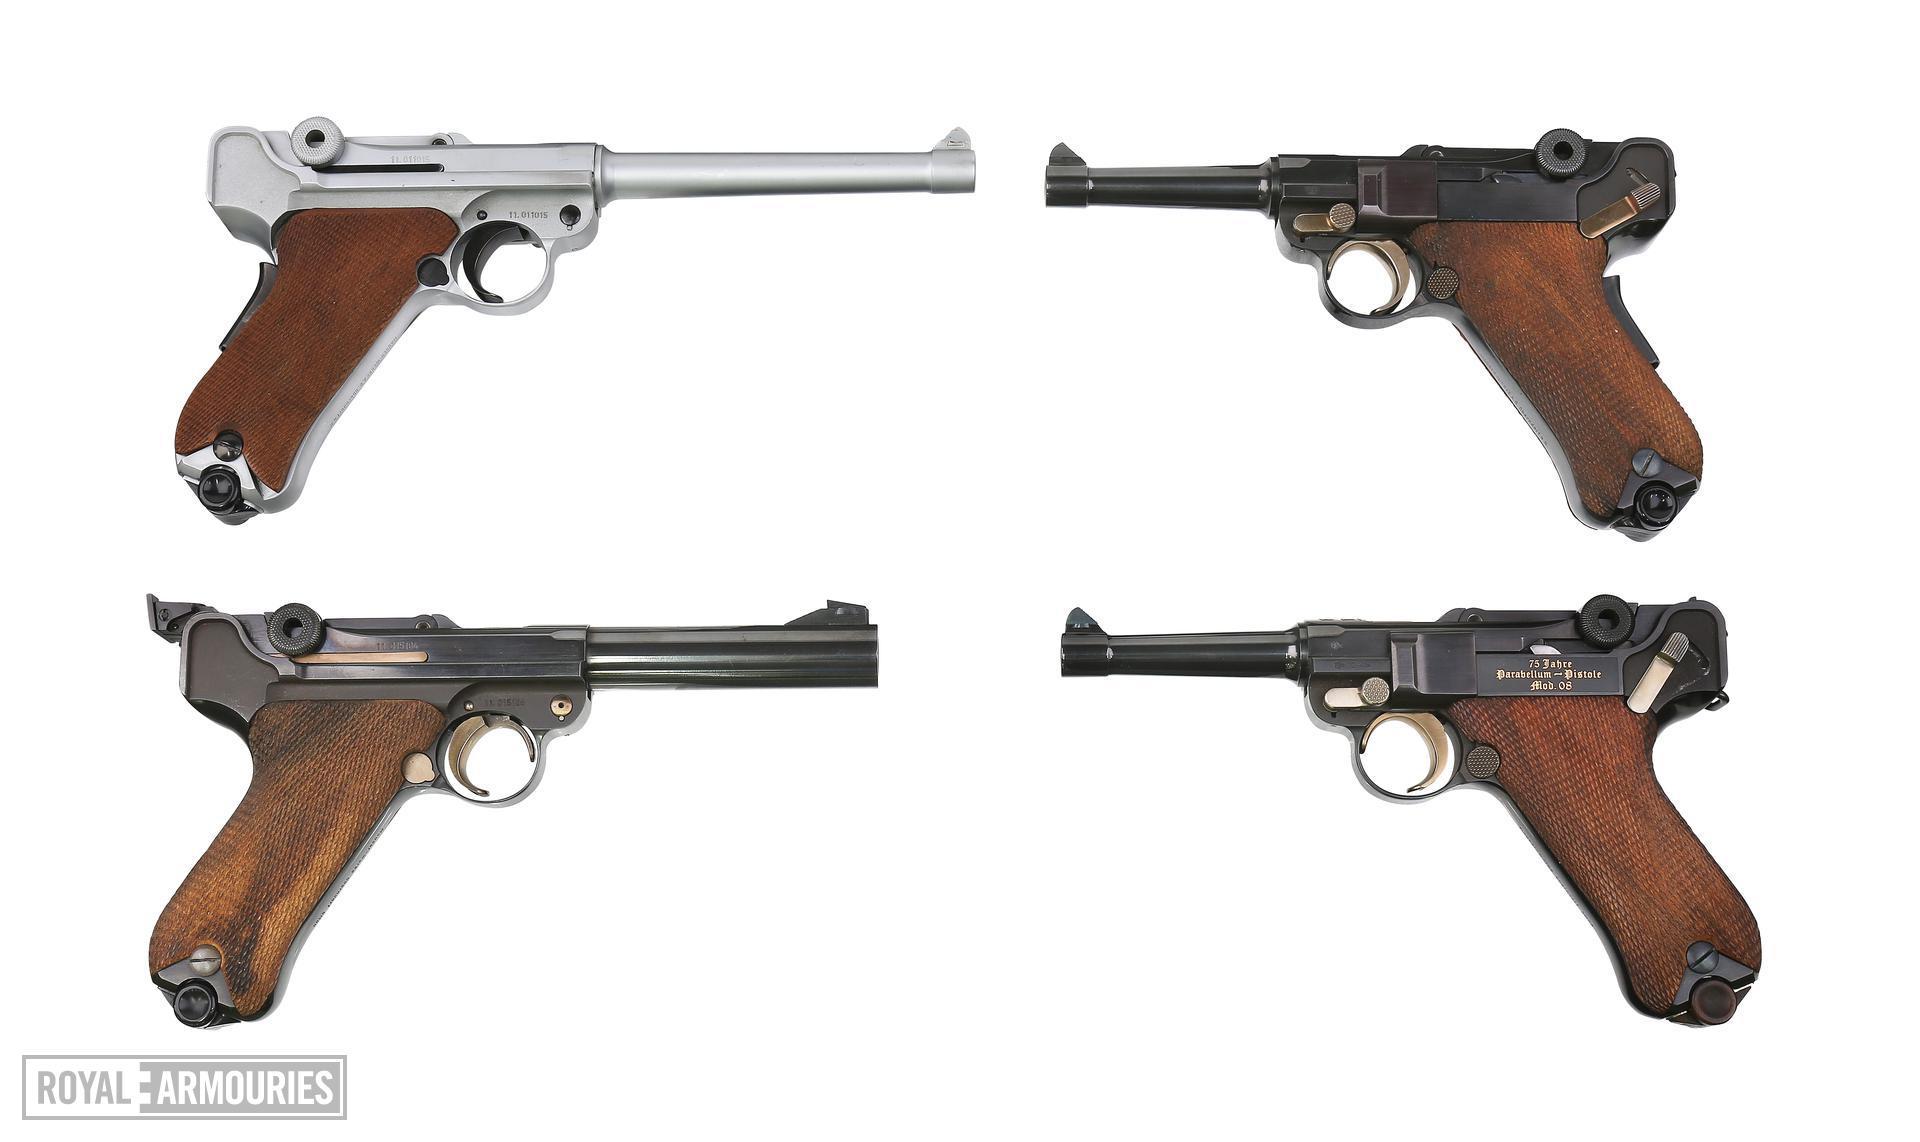 Rimfire self-loading pistol - Luger Postwar